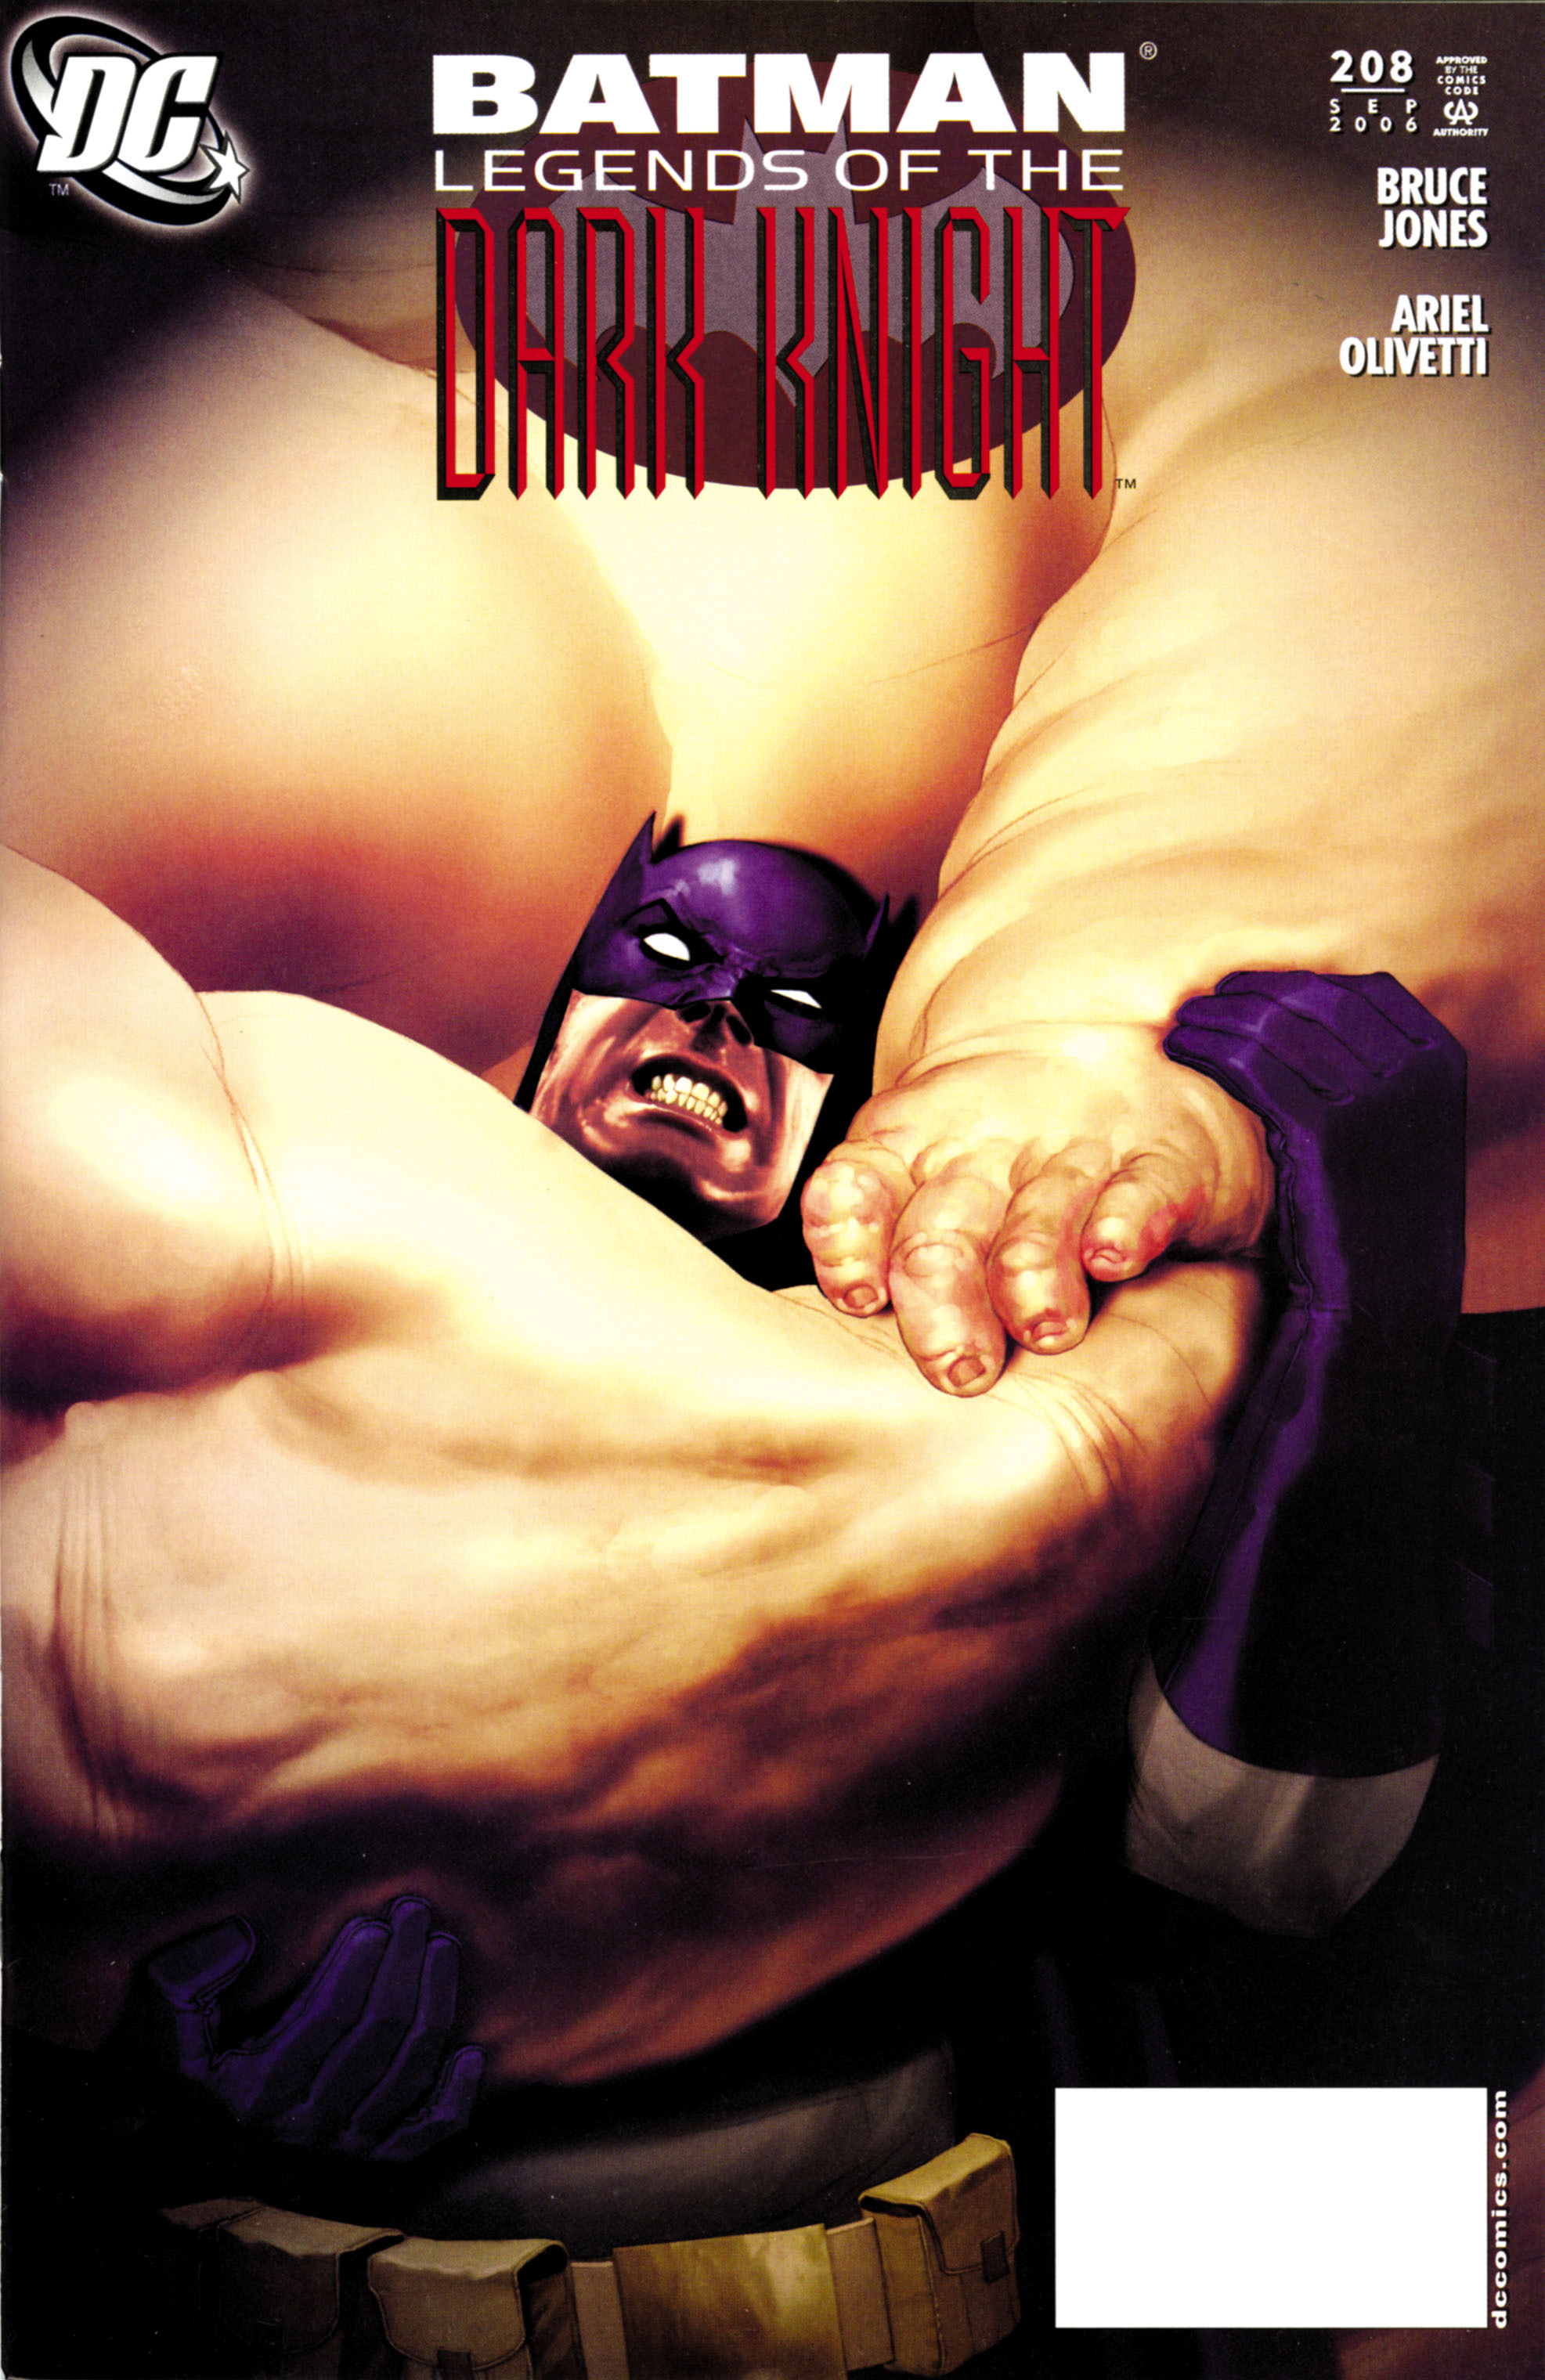 Batman: Legends of the Dark Knight 208 Page 1